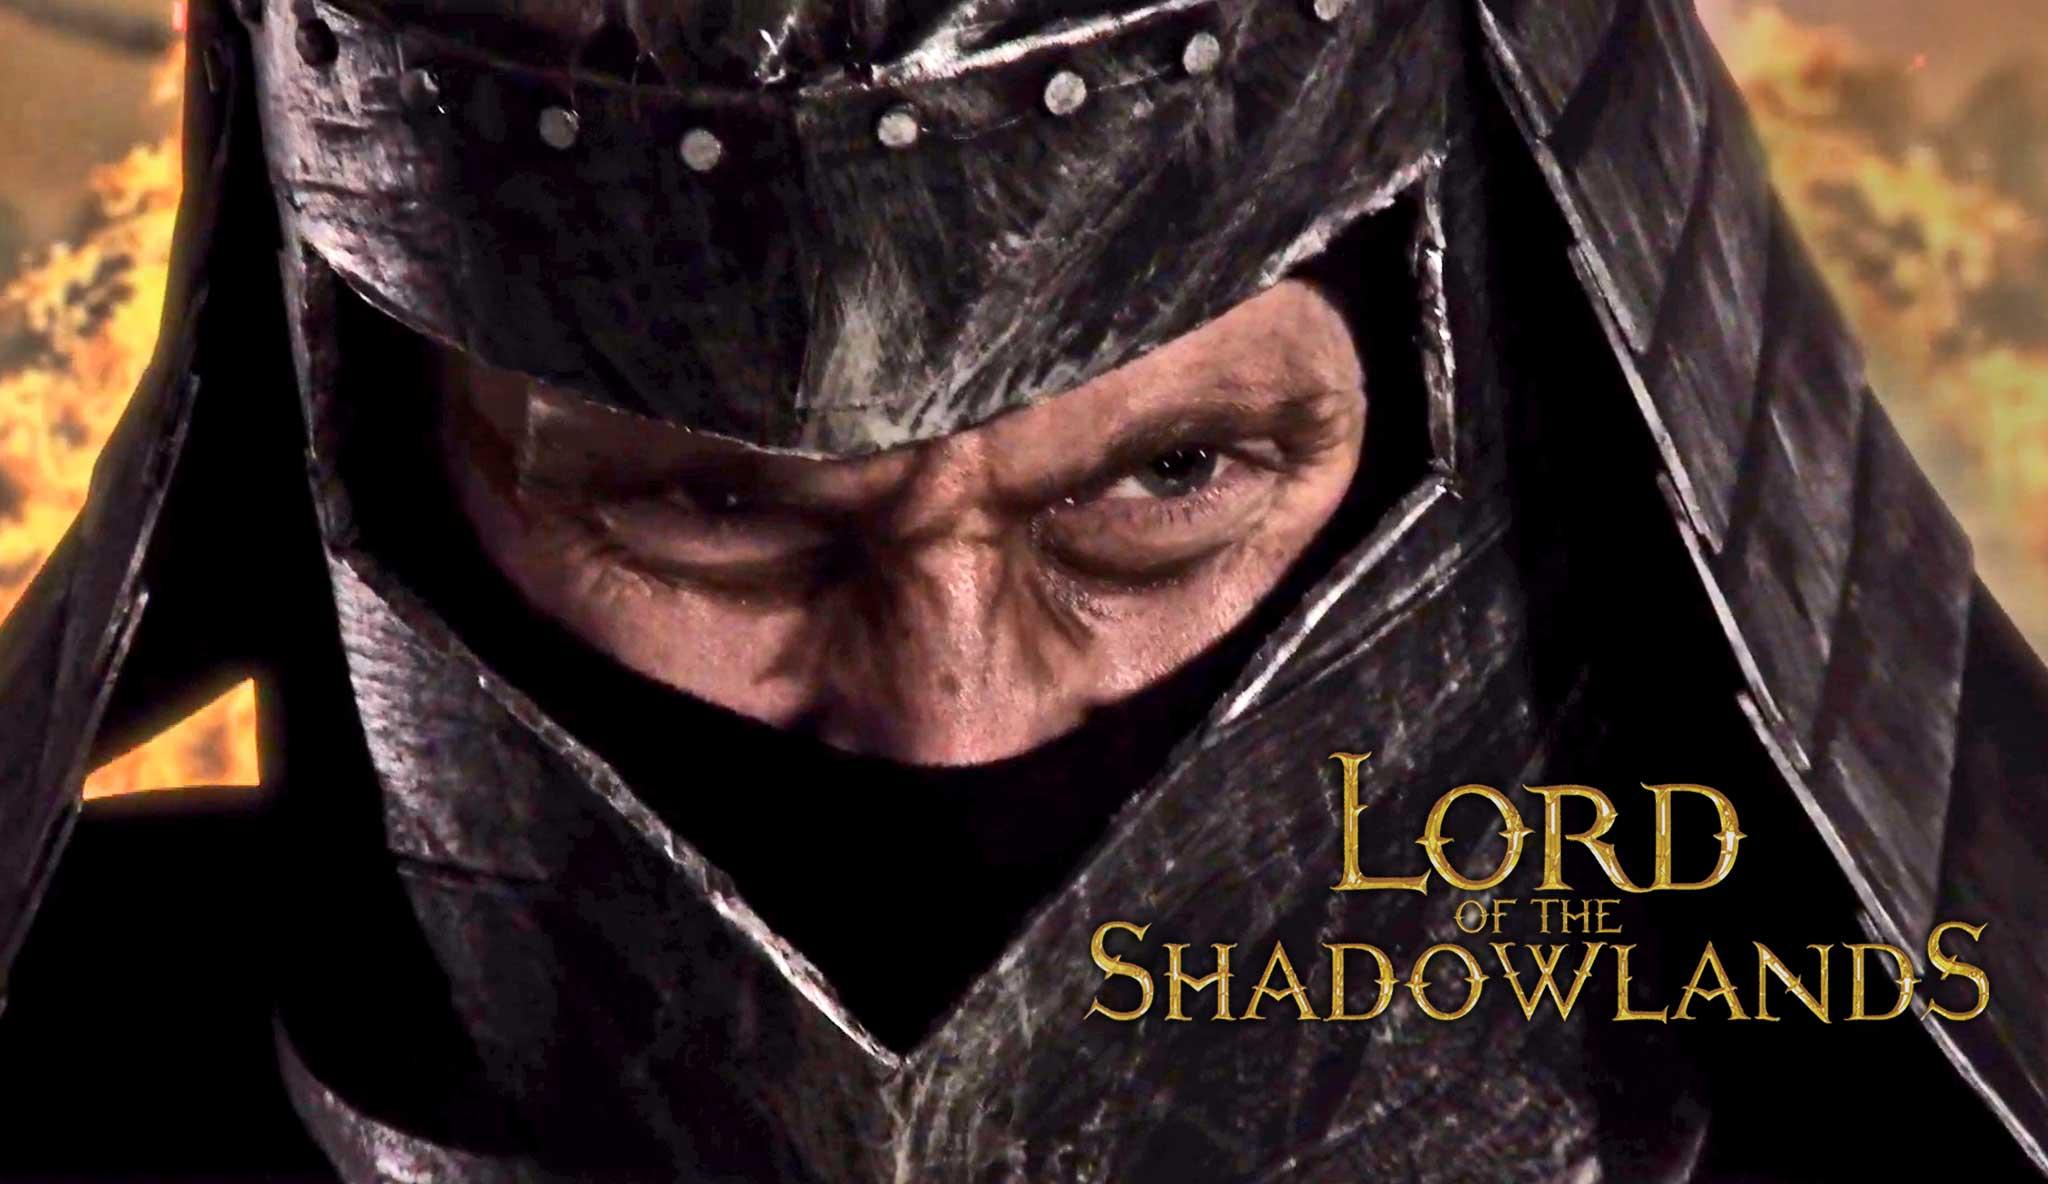 lord-of-the-shadowlands\header.jpg